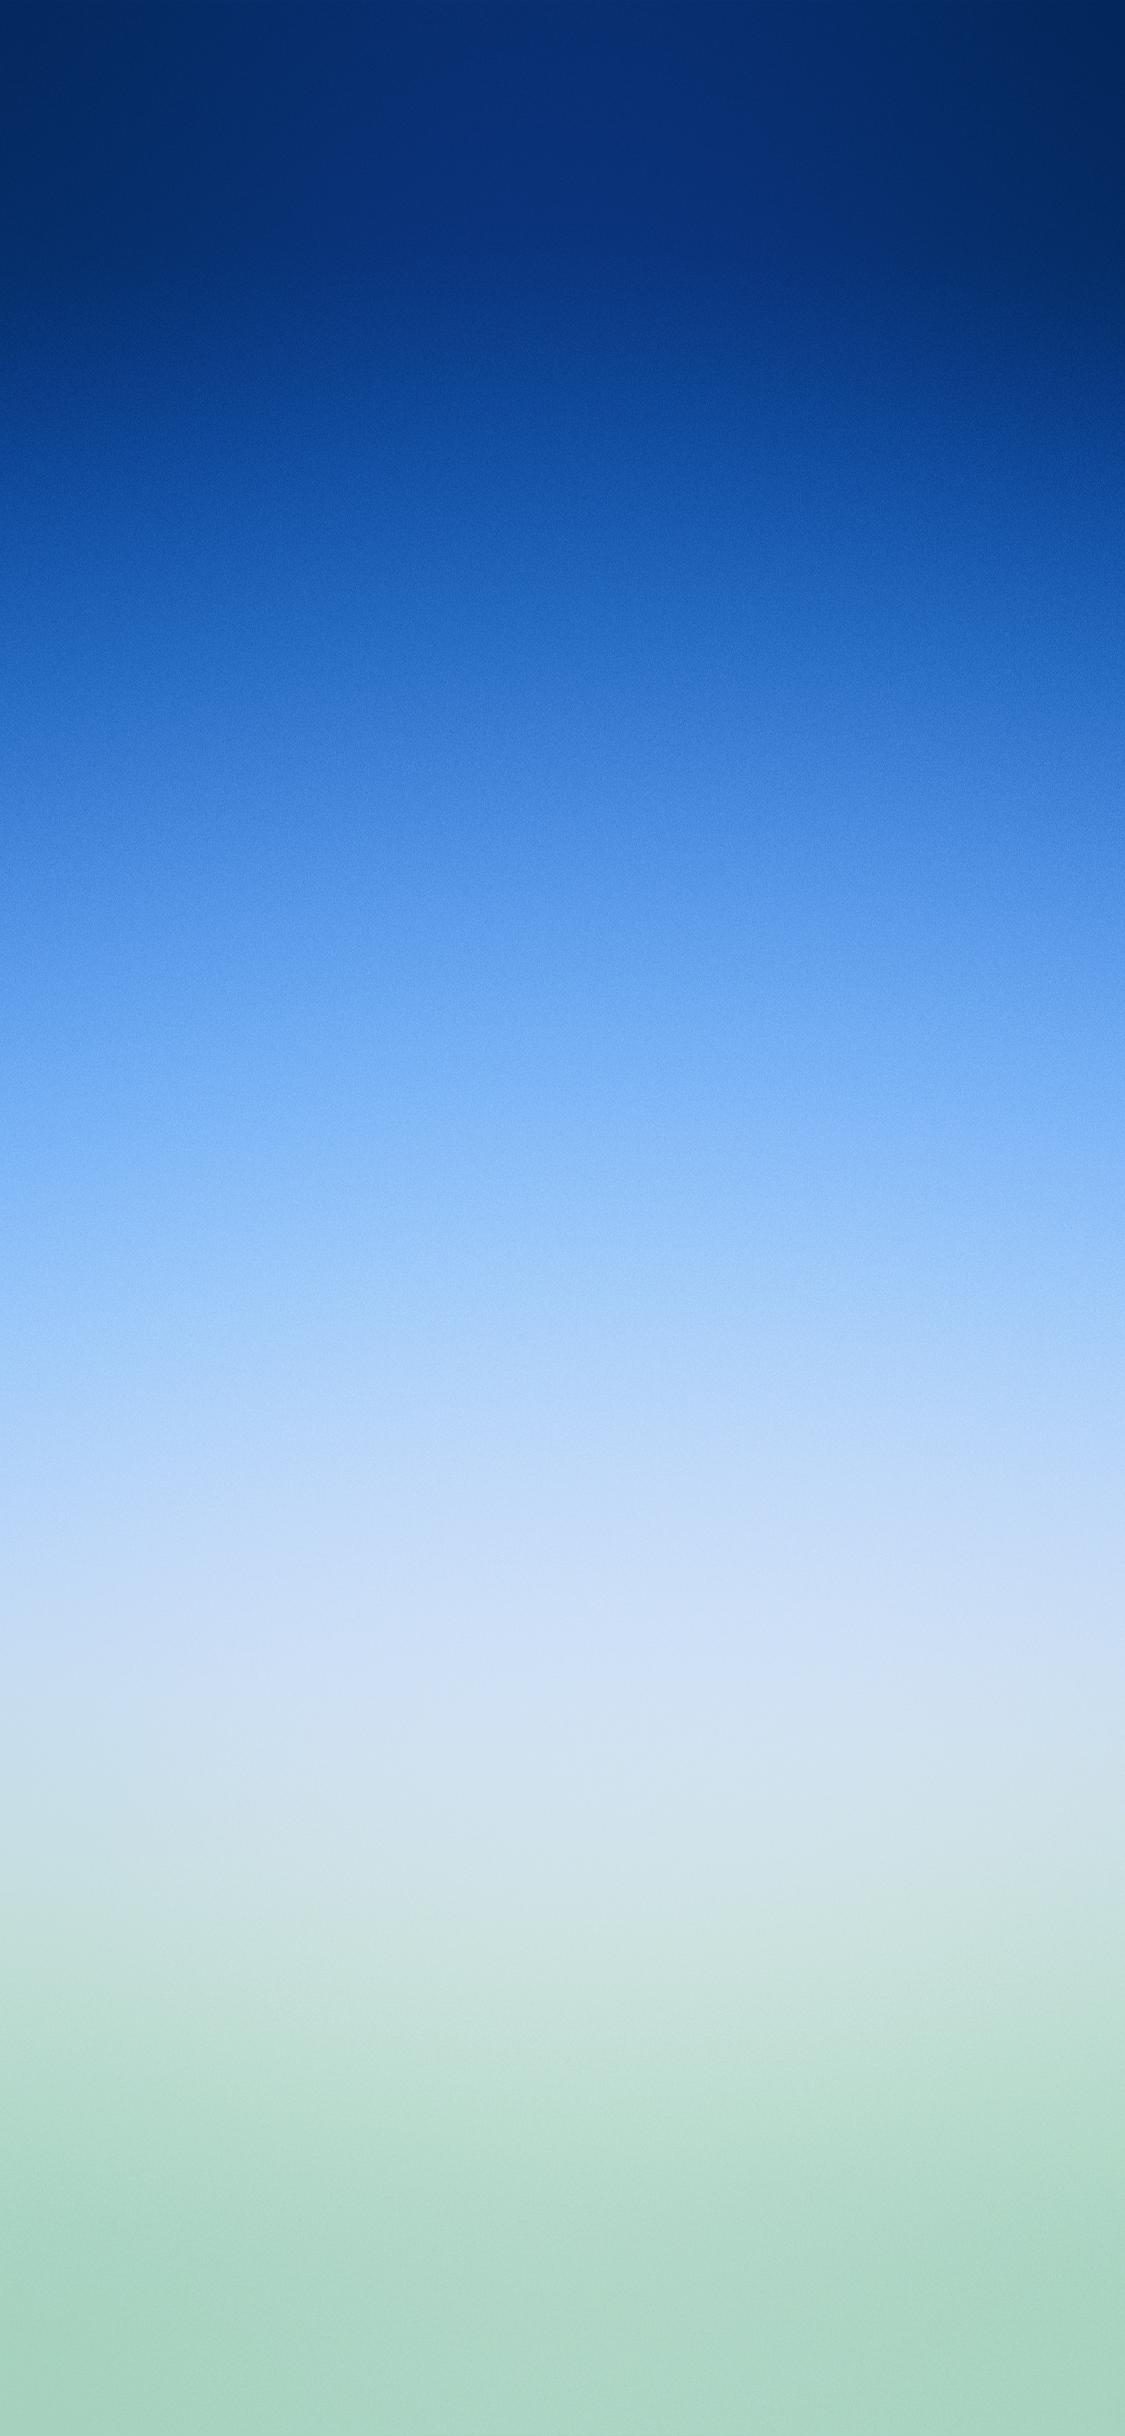 Apple original wallpaper of blue to green gradient